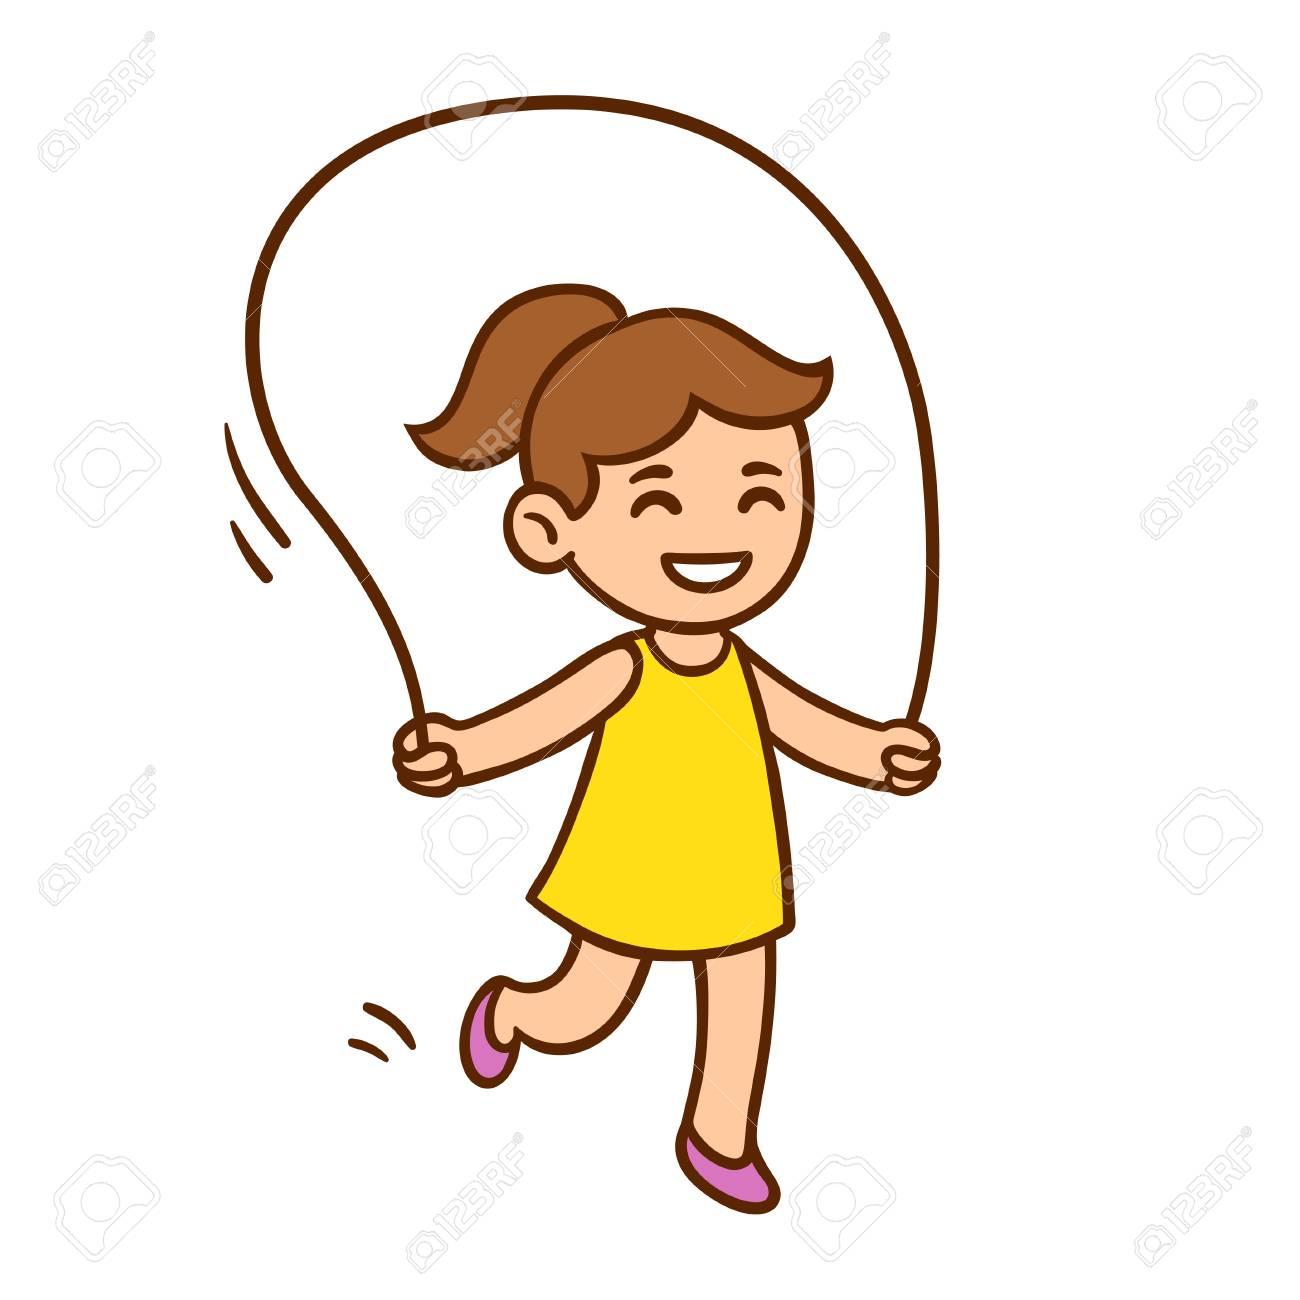 vector illustration of cute cartoon little girl jumping rope rh 123rf com cartoon clip art free images cartoon clipart images